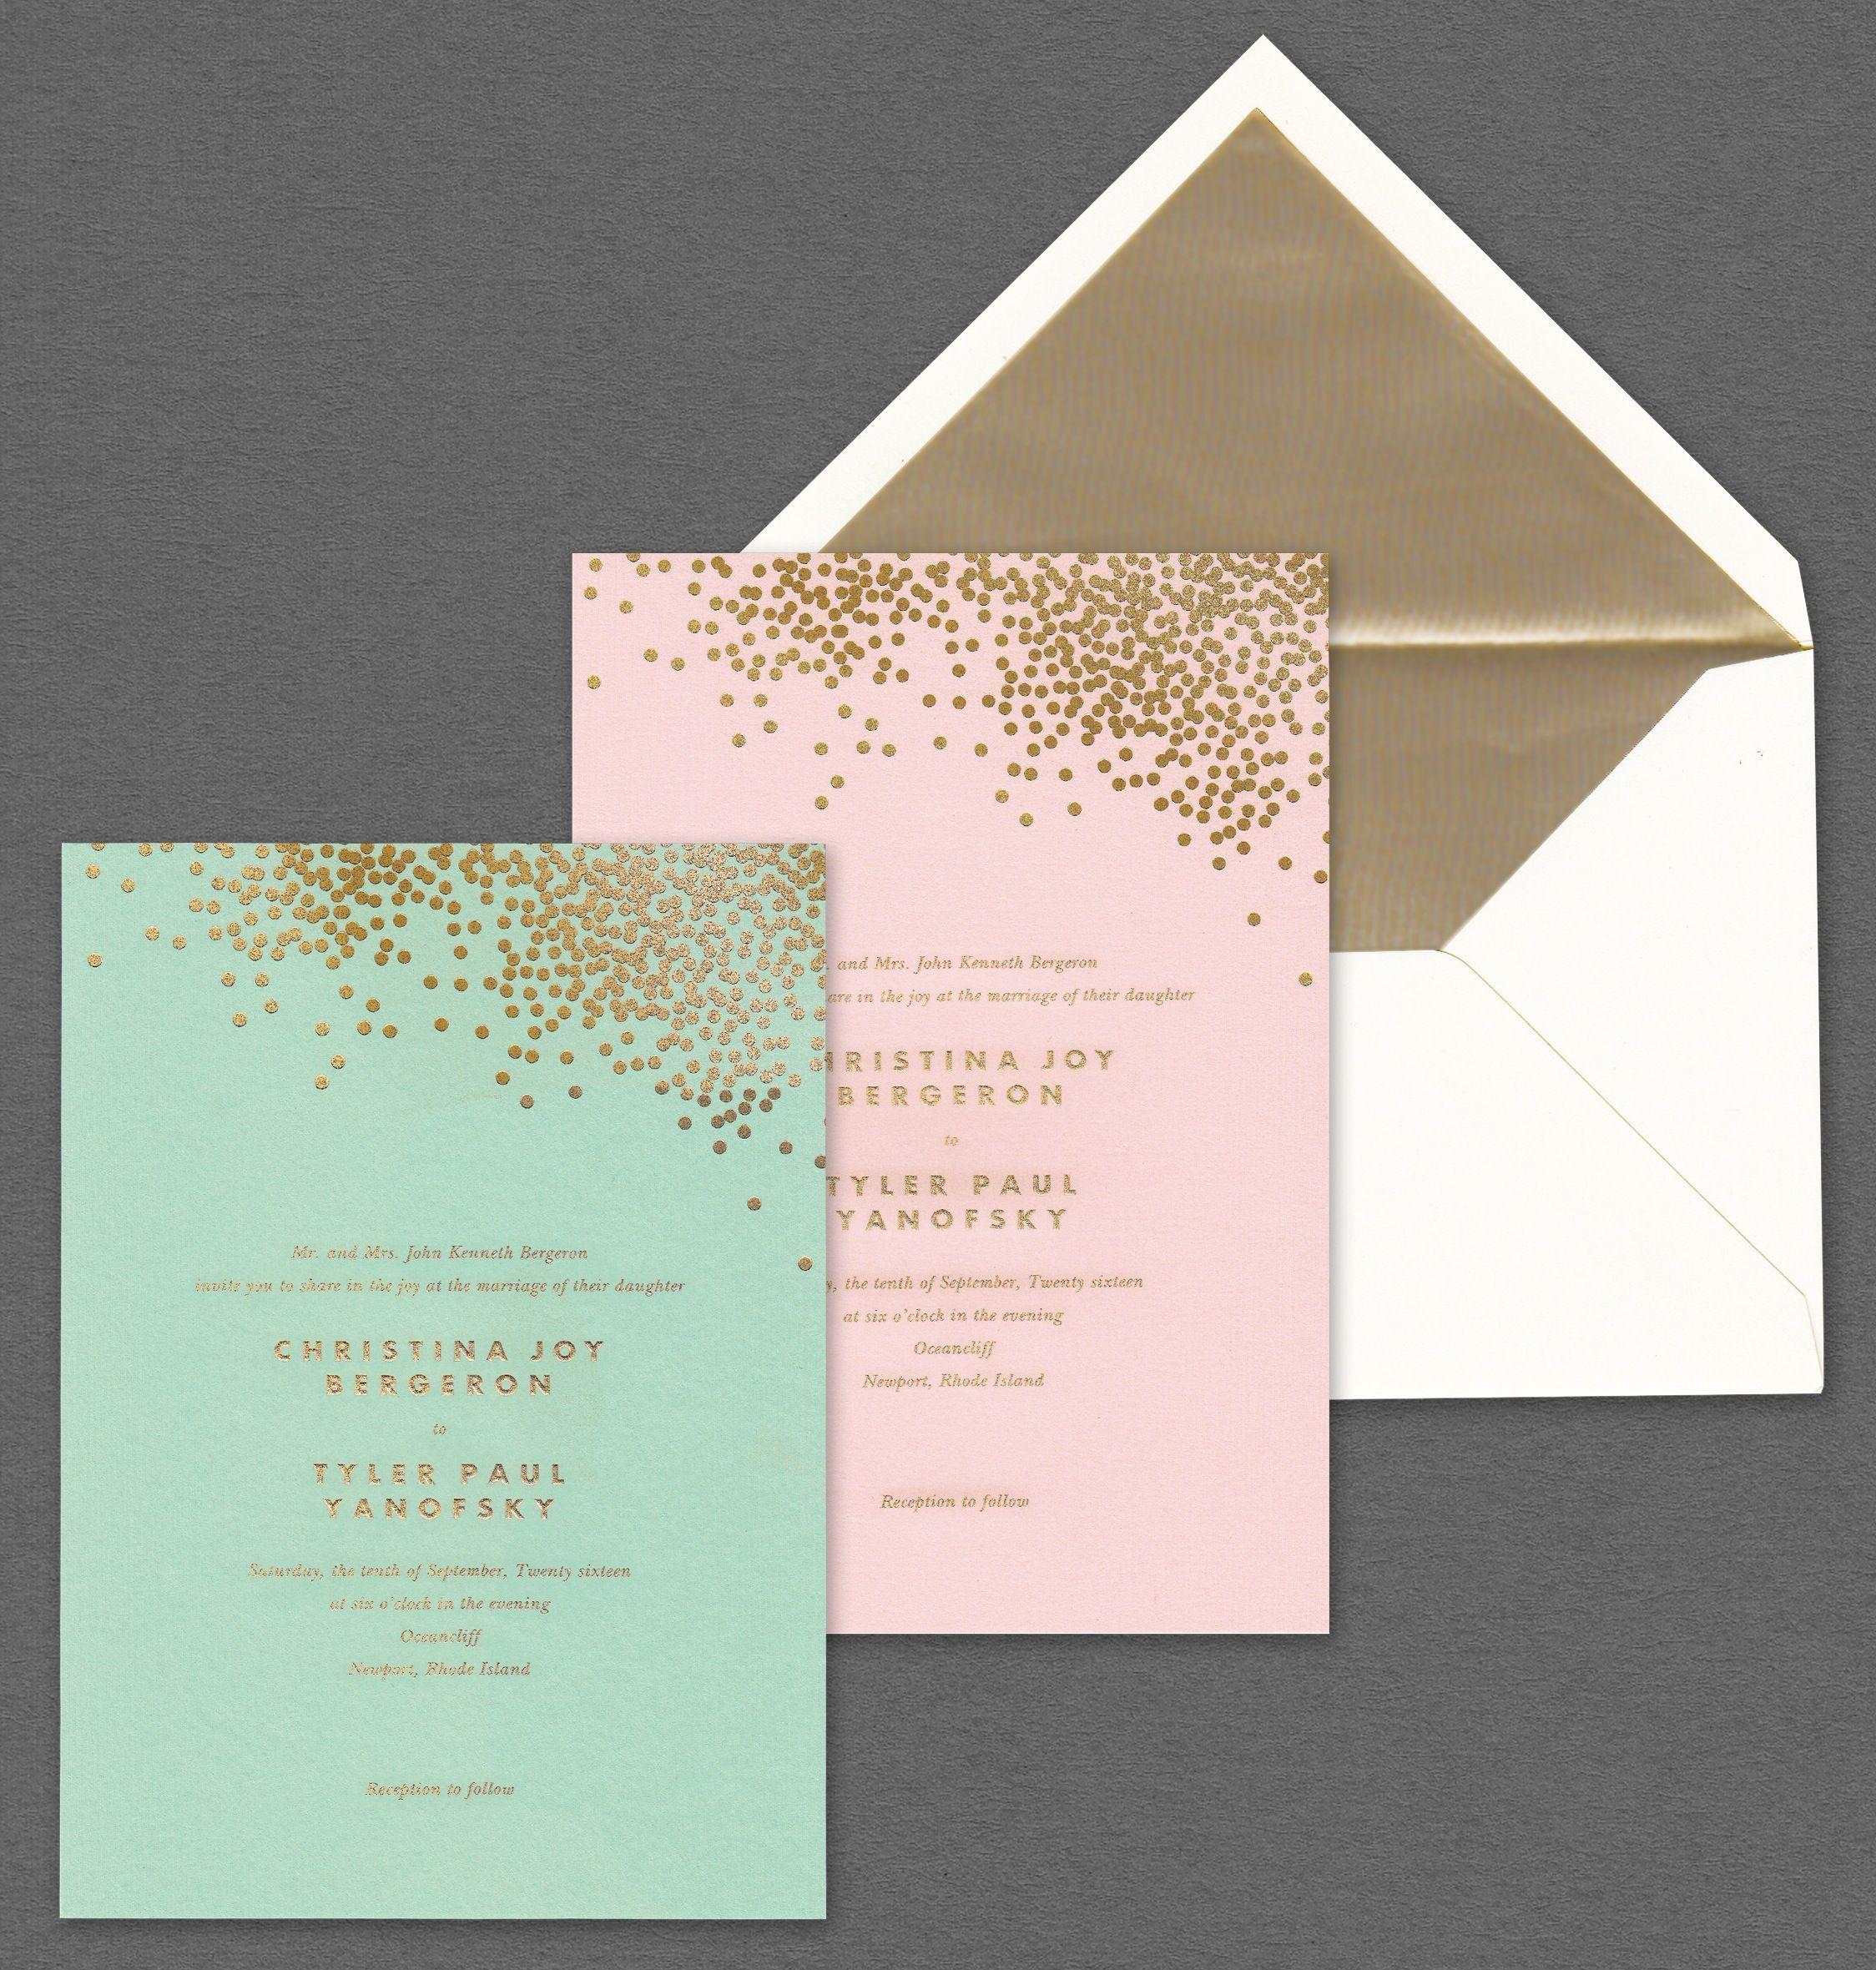 Wedding invitations templates card invitation ideas for wedding wedding invitations templates card invitation ideas for wedding stopboris Gallery